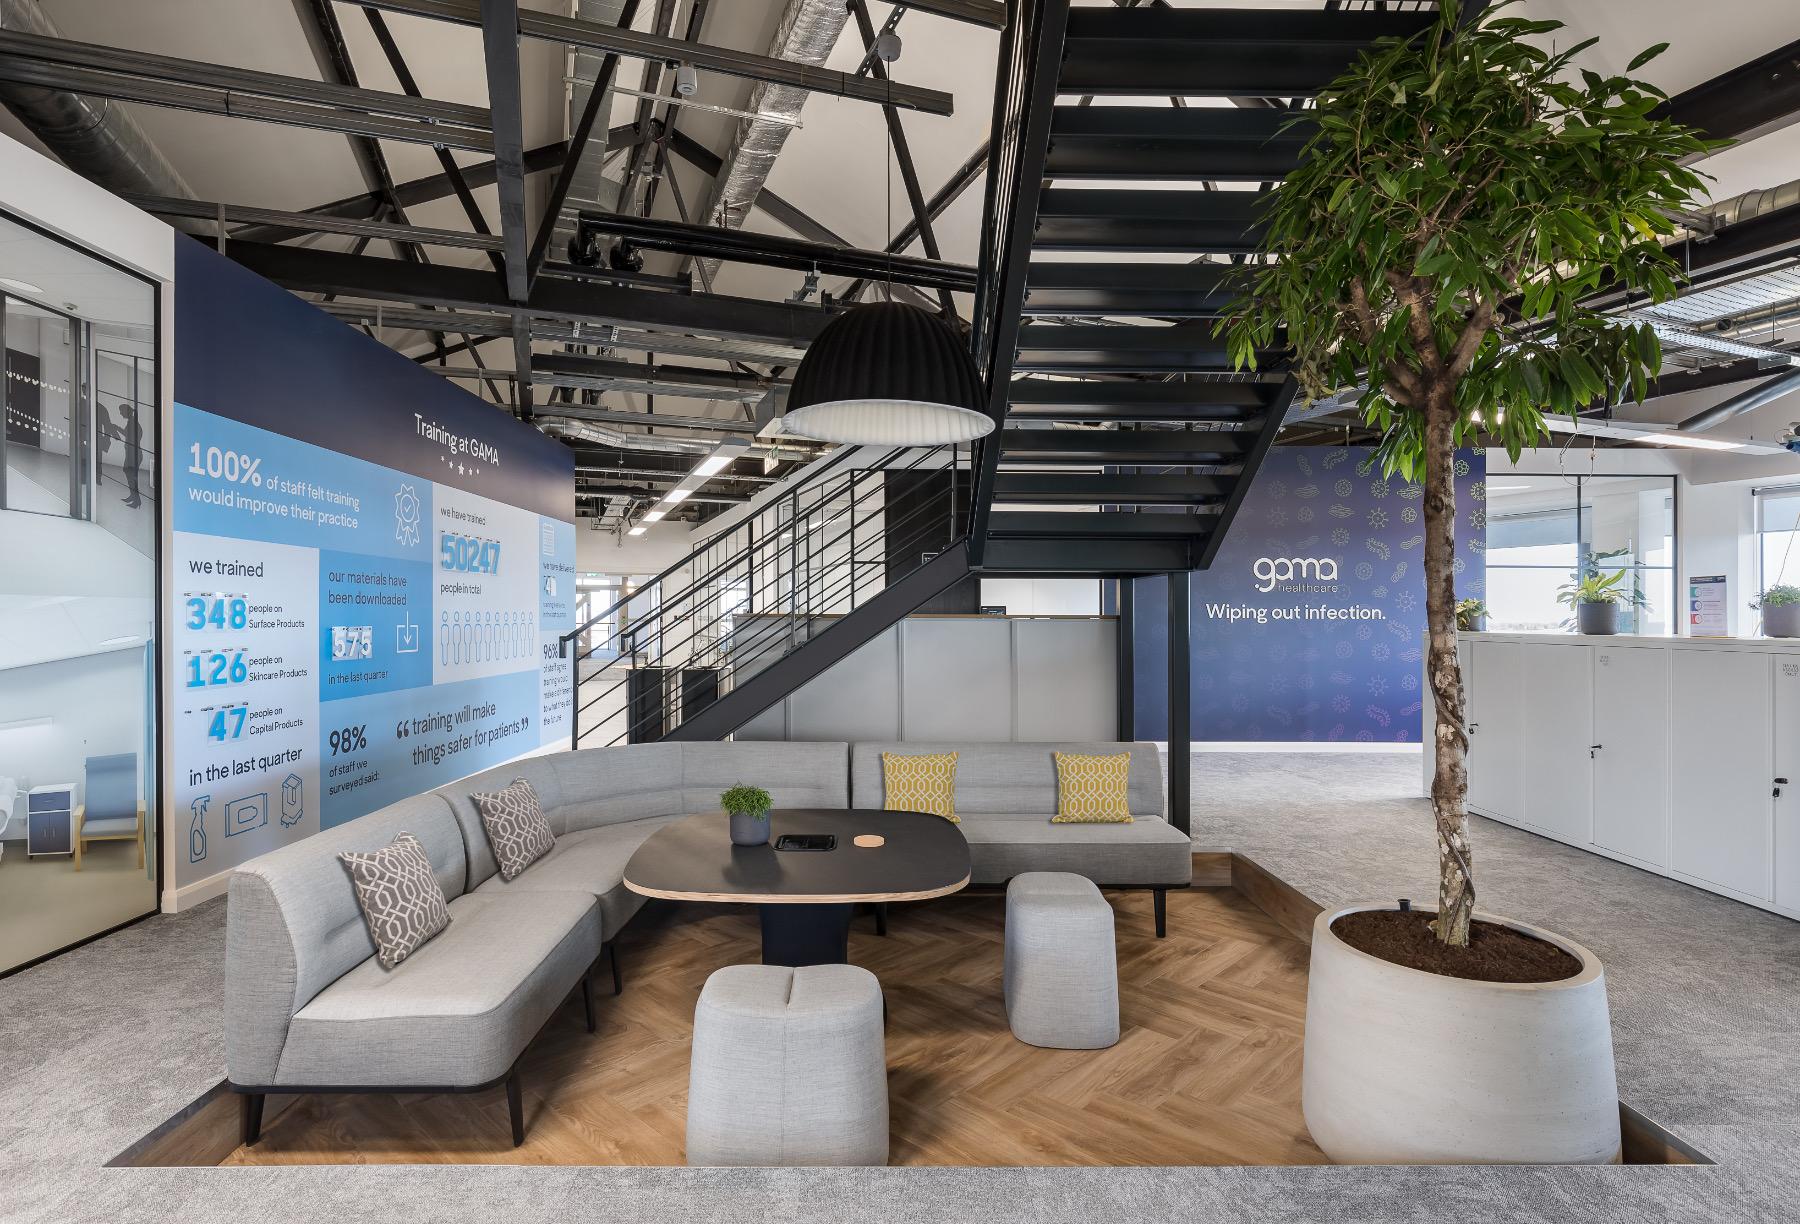 gama-healthcare-office-17